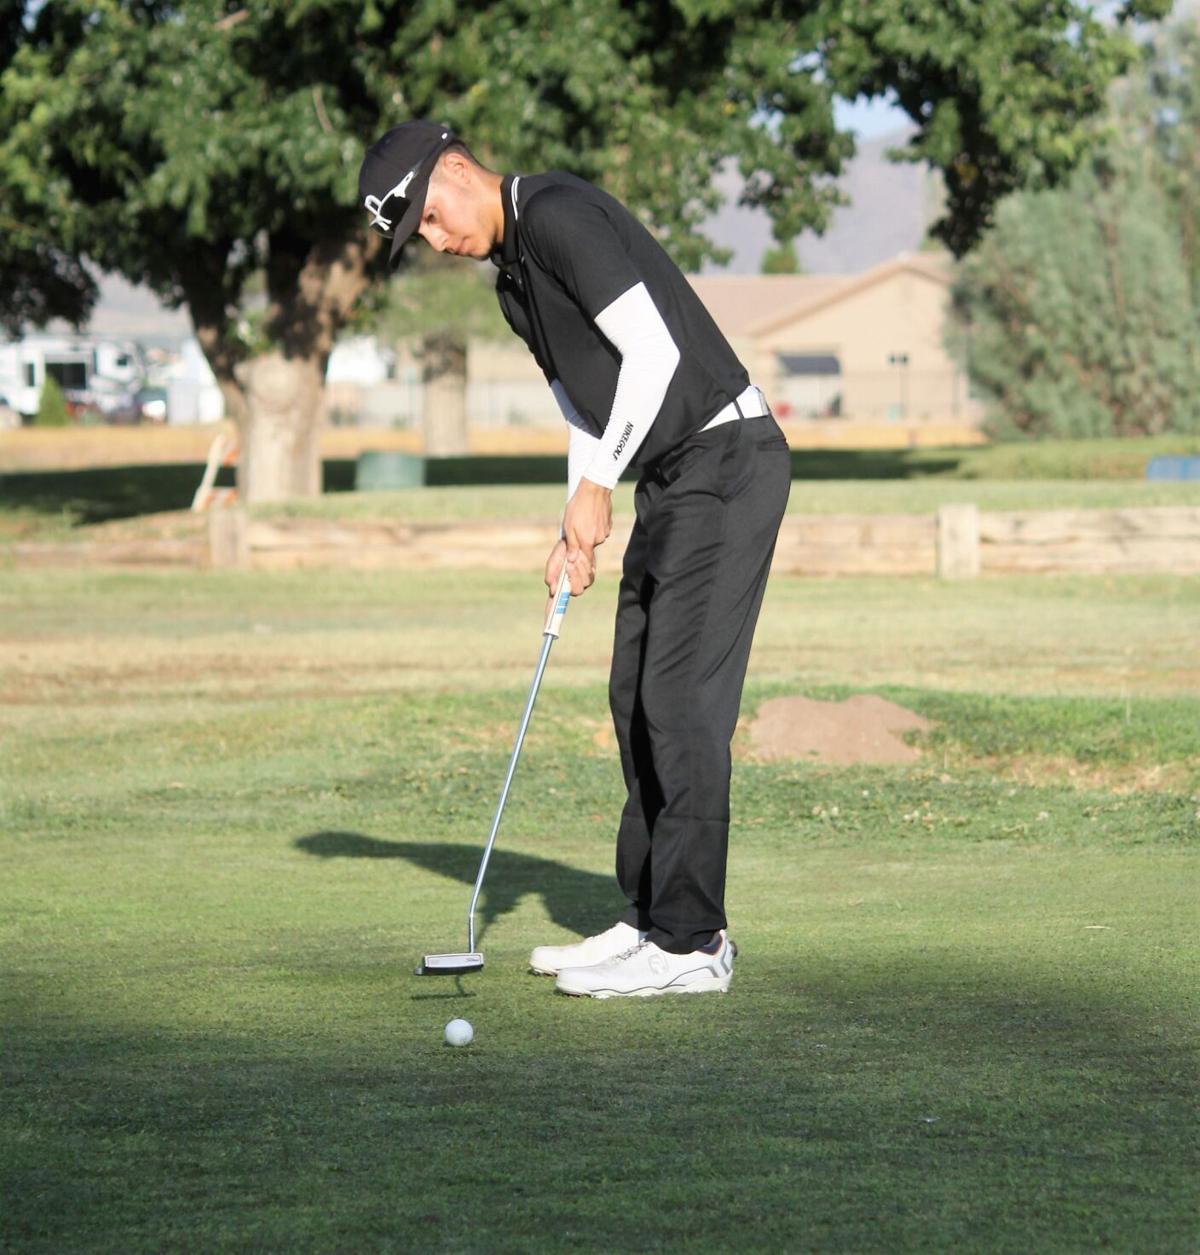 85th Annual Labor Day Golf Tournament 2.jpg